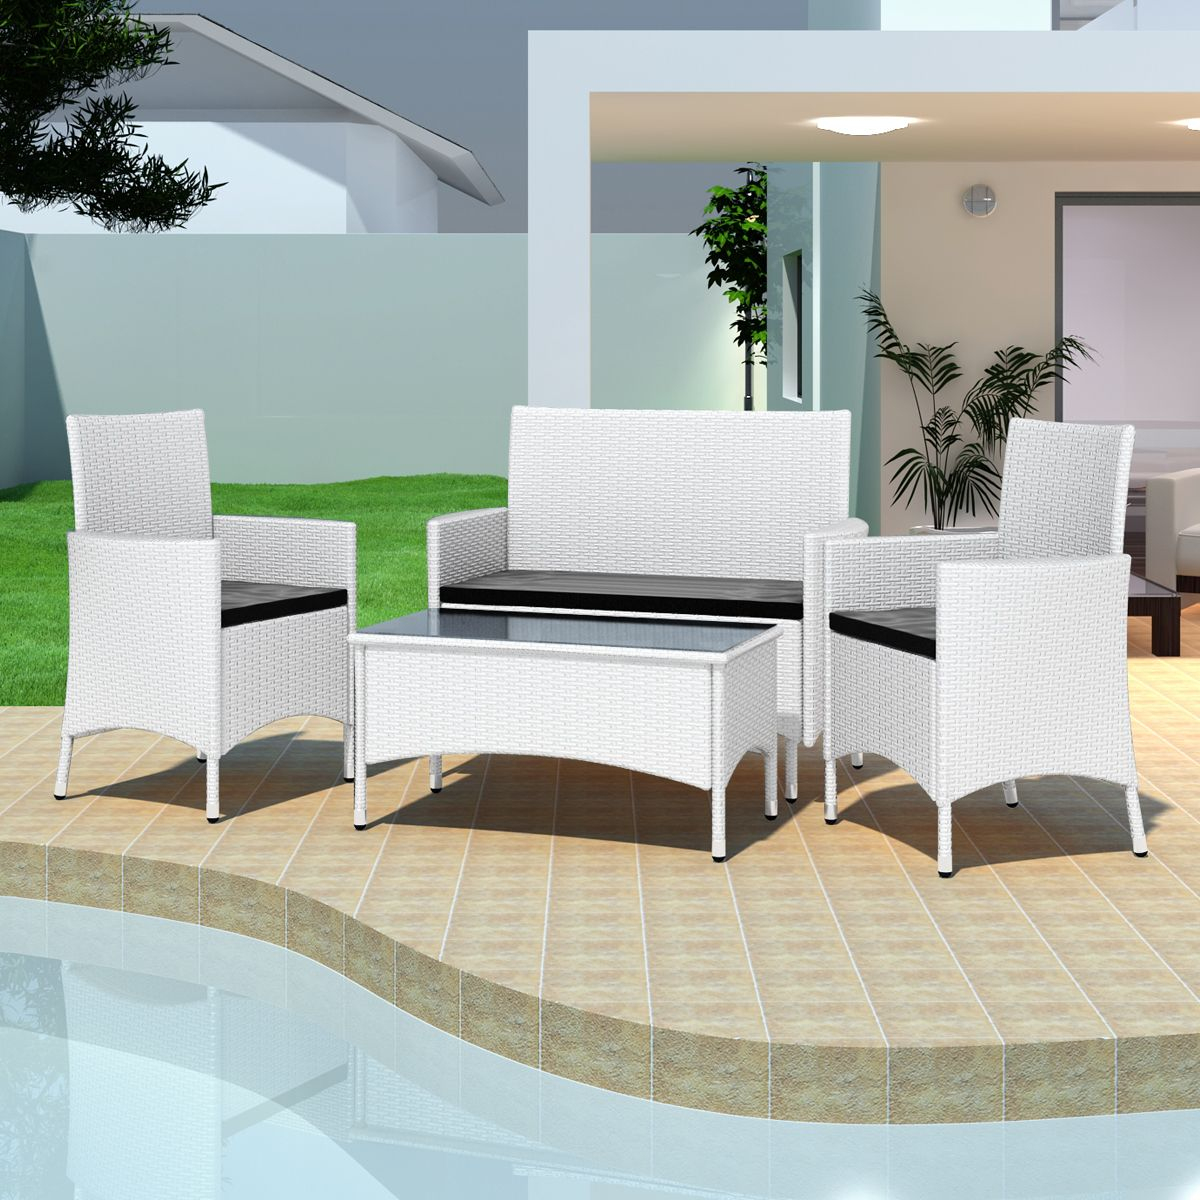 Salon De Jardin Blanc En Résine Tressée 2 Chaises Table ... serapportantà Salon De Jardin Blanc Design